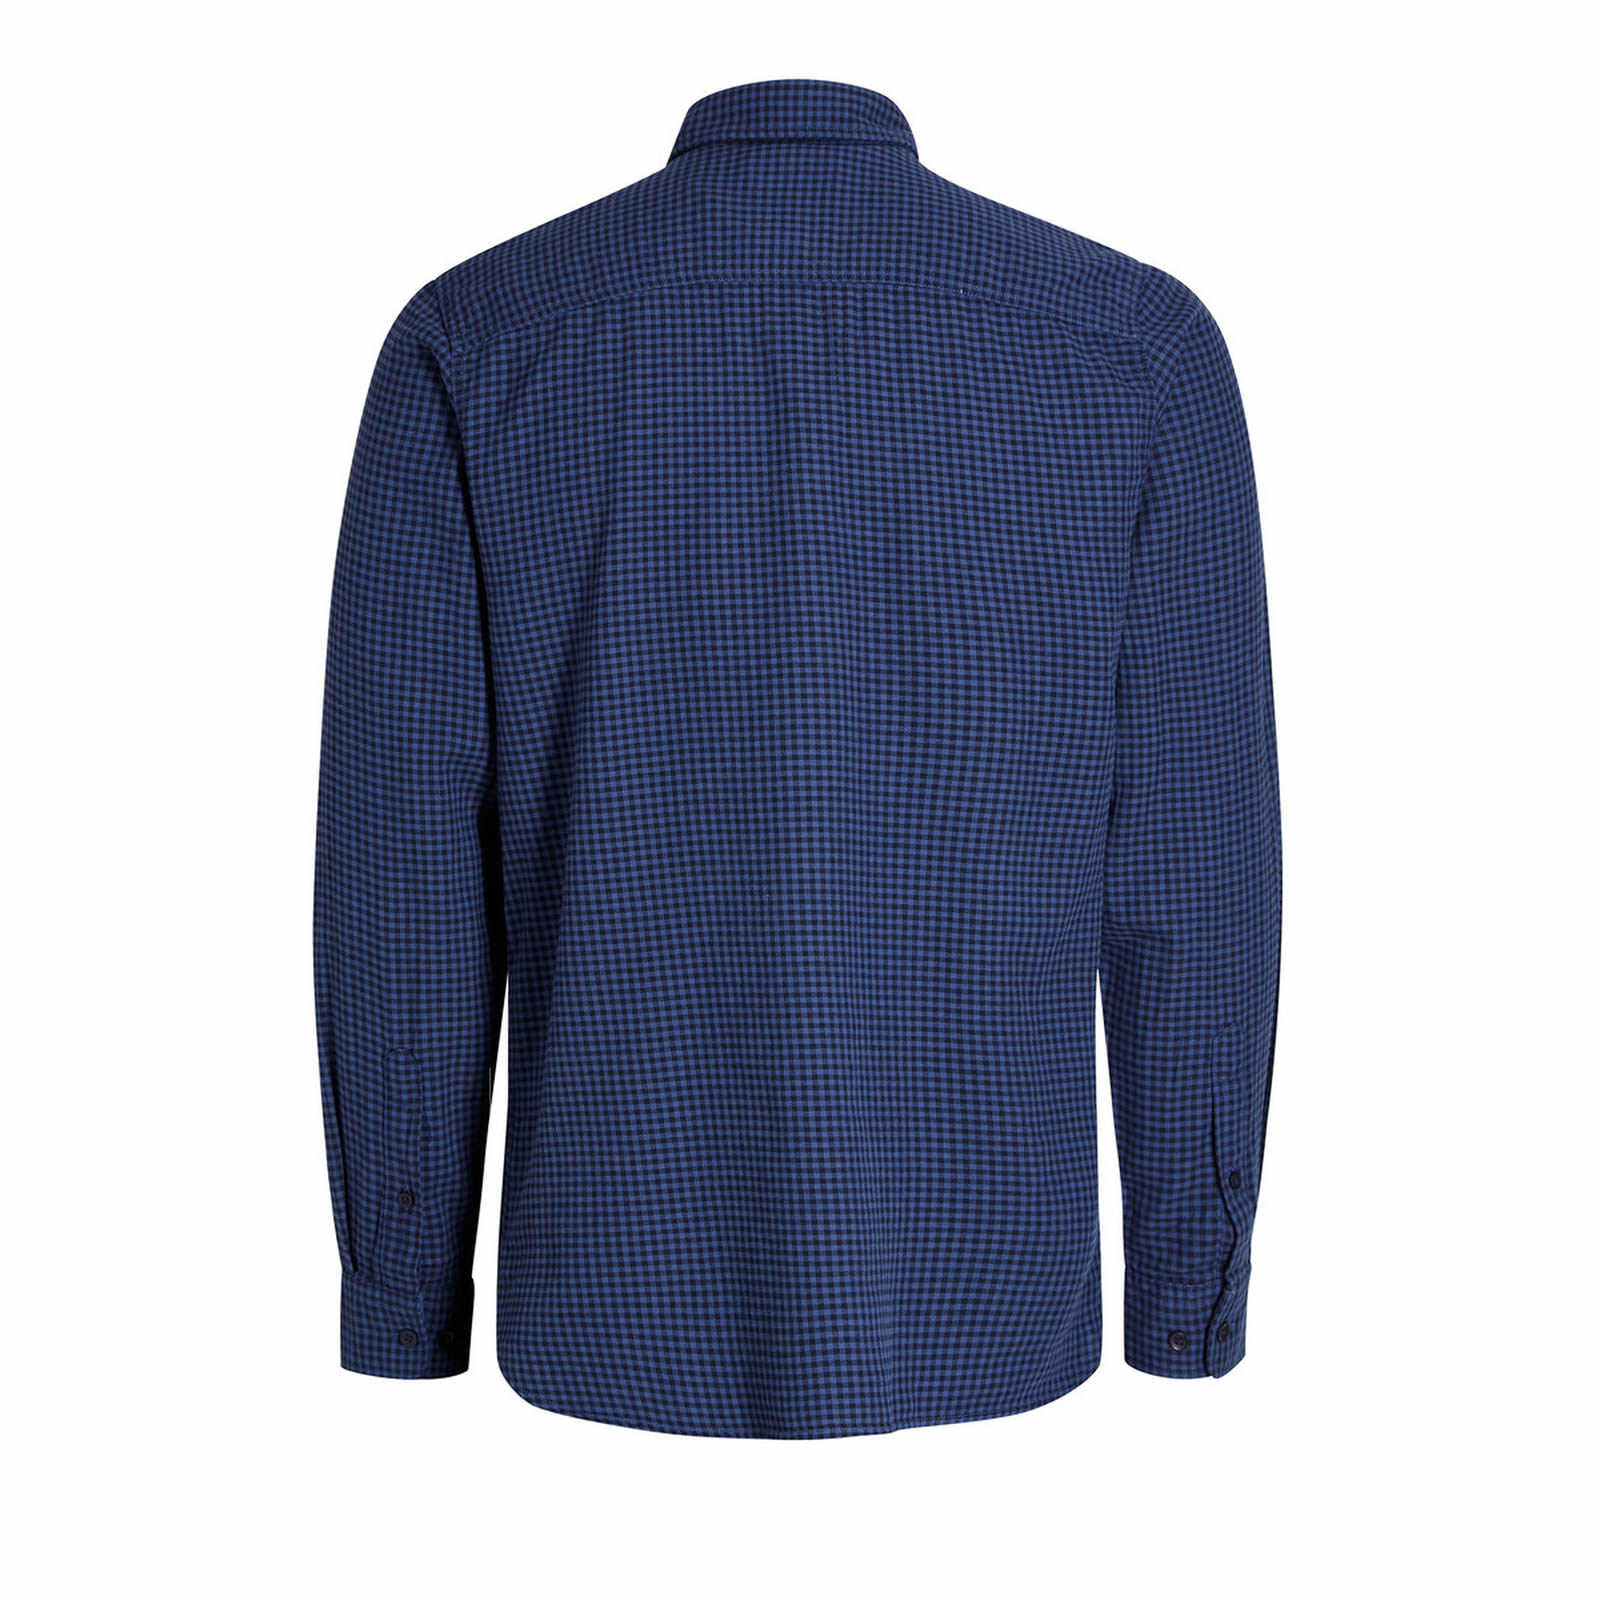 Mens-Check-Shirt-JACK-amp-JONES-Johan-Long-Sleeve-Collared-Cotton-Casual-Shirt thumbnail 9